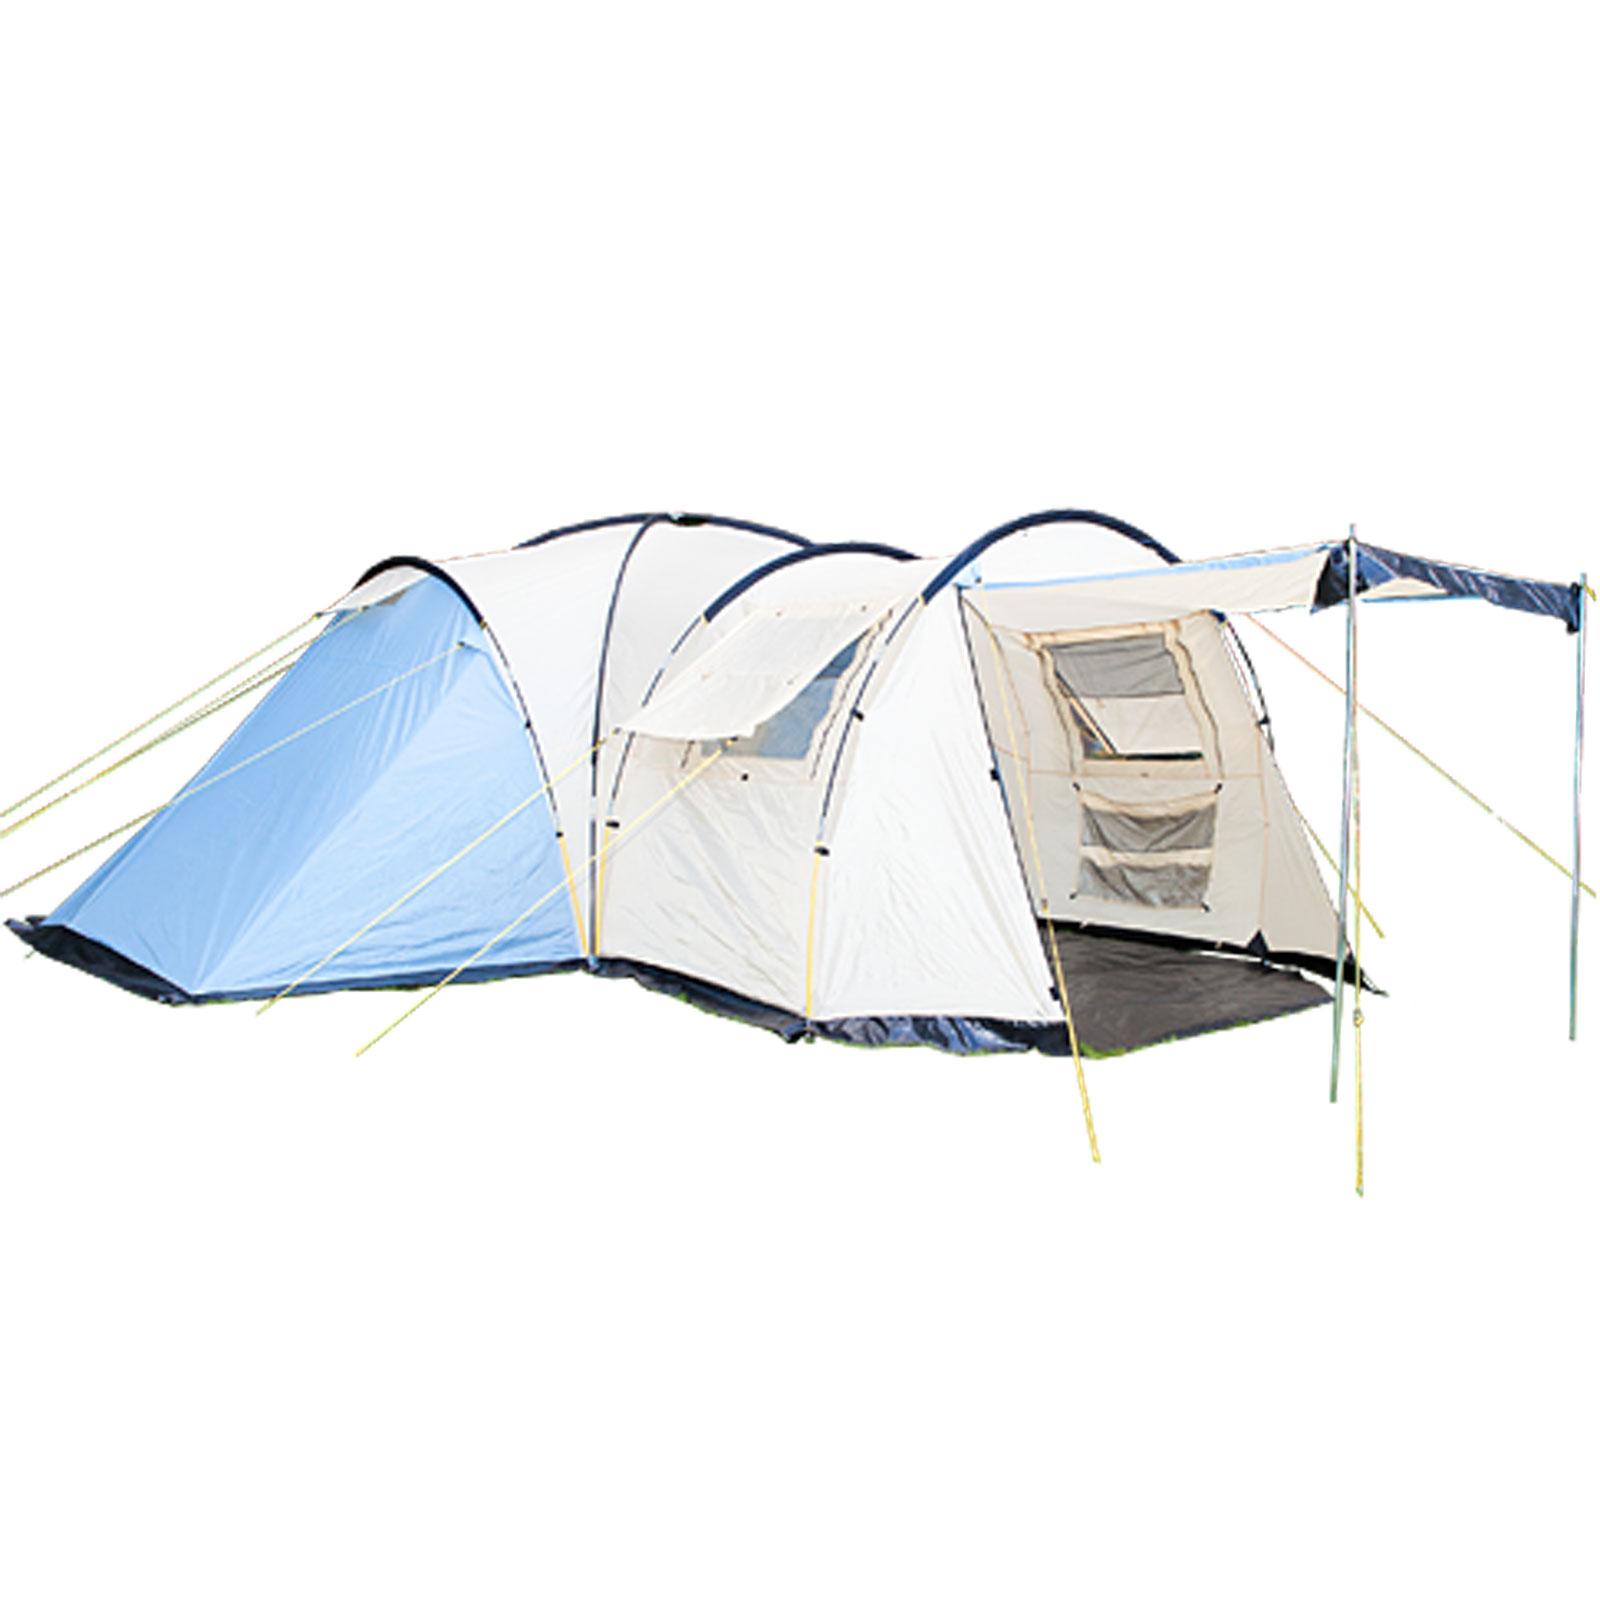 kuppelzelt skandika toronto 6 mann gruppen zelt 3 schlafkabinen 5000ws blau beige max. Black Bedroom Furniture Sets. Home Design Ideas